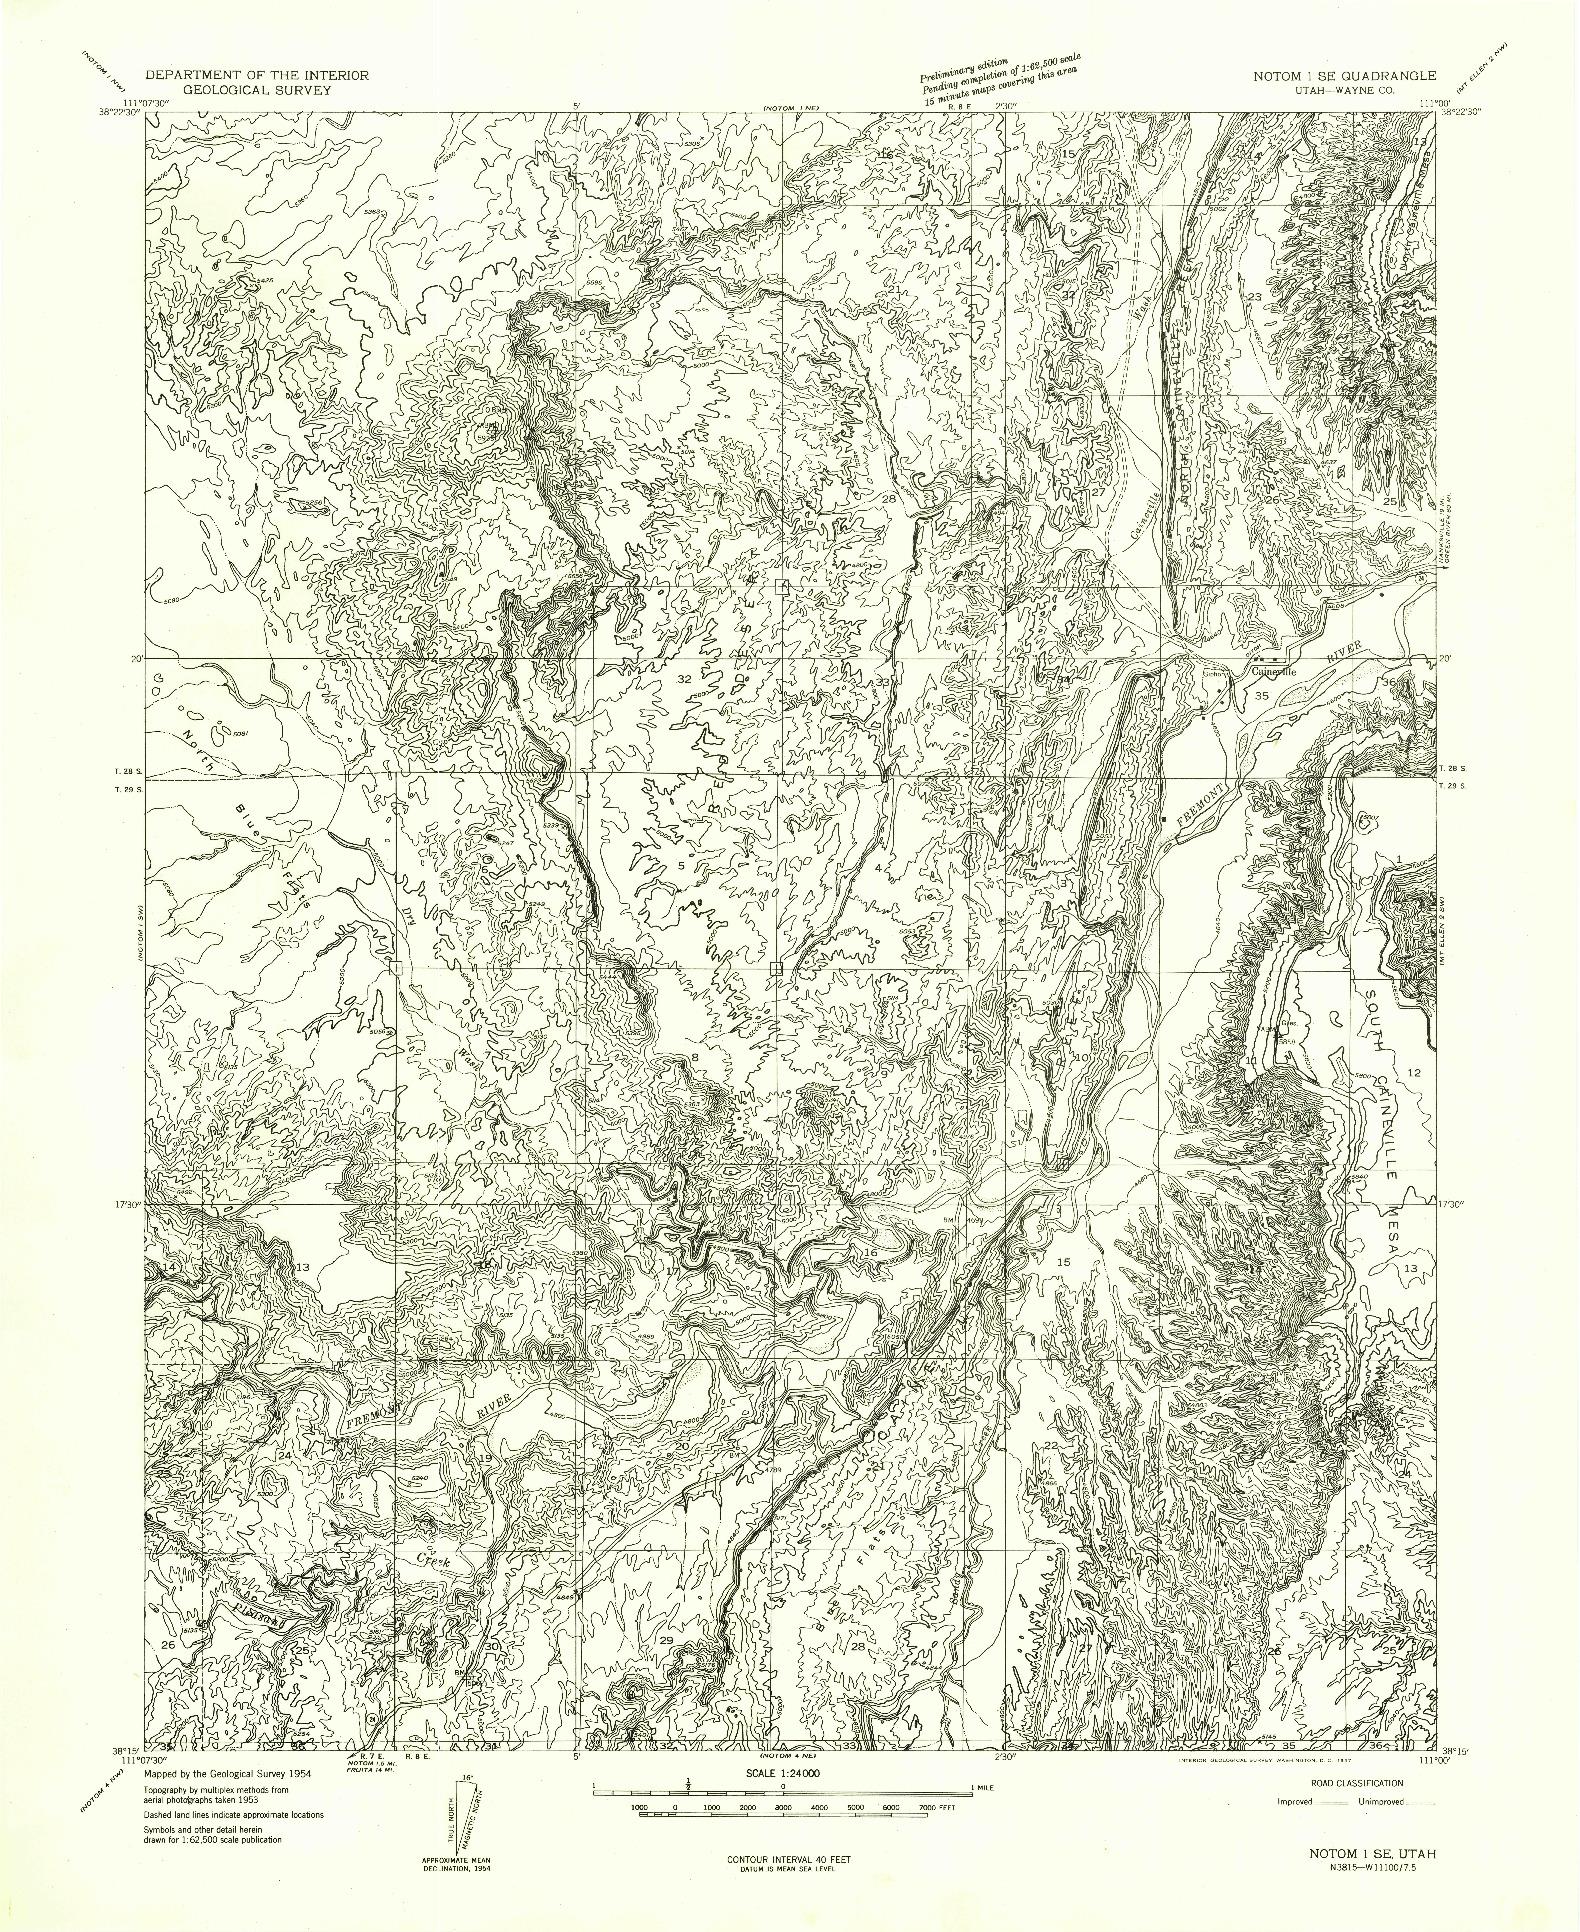 USGS 1:24000-SCALE QUADRANGLE FOR NOTOM 1 SE, UT 1954